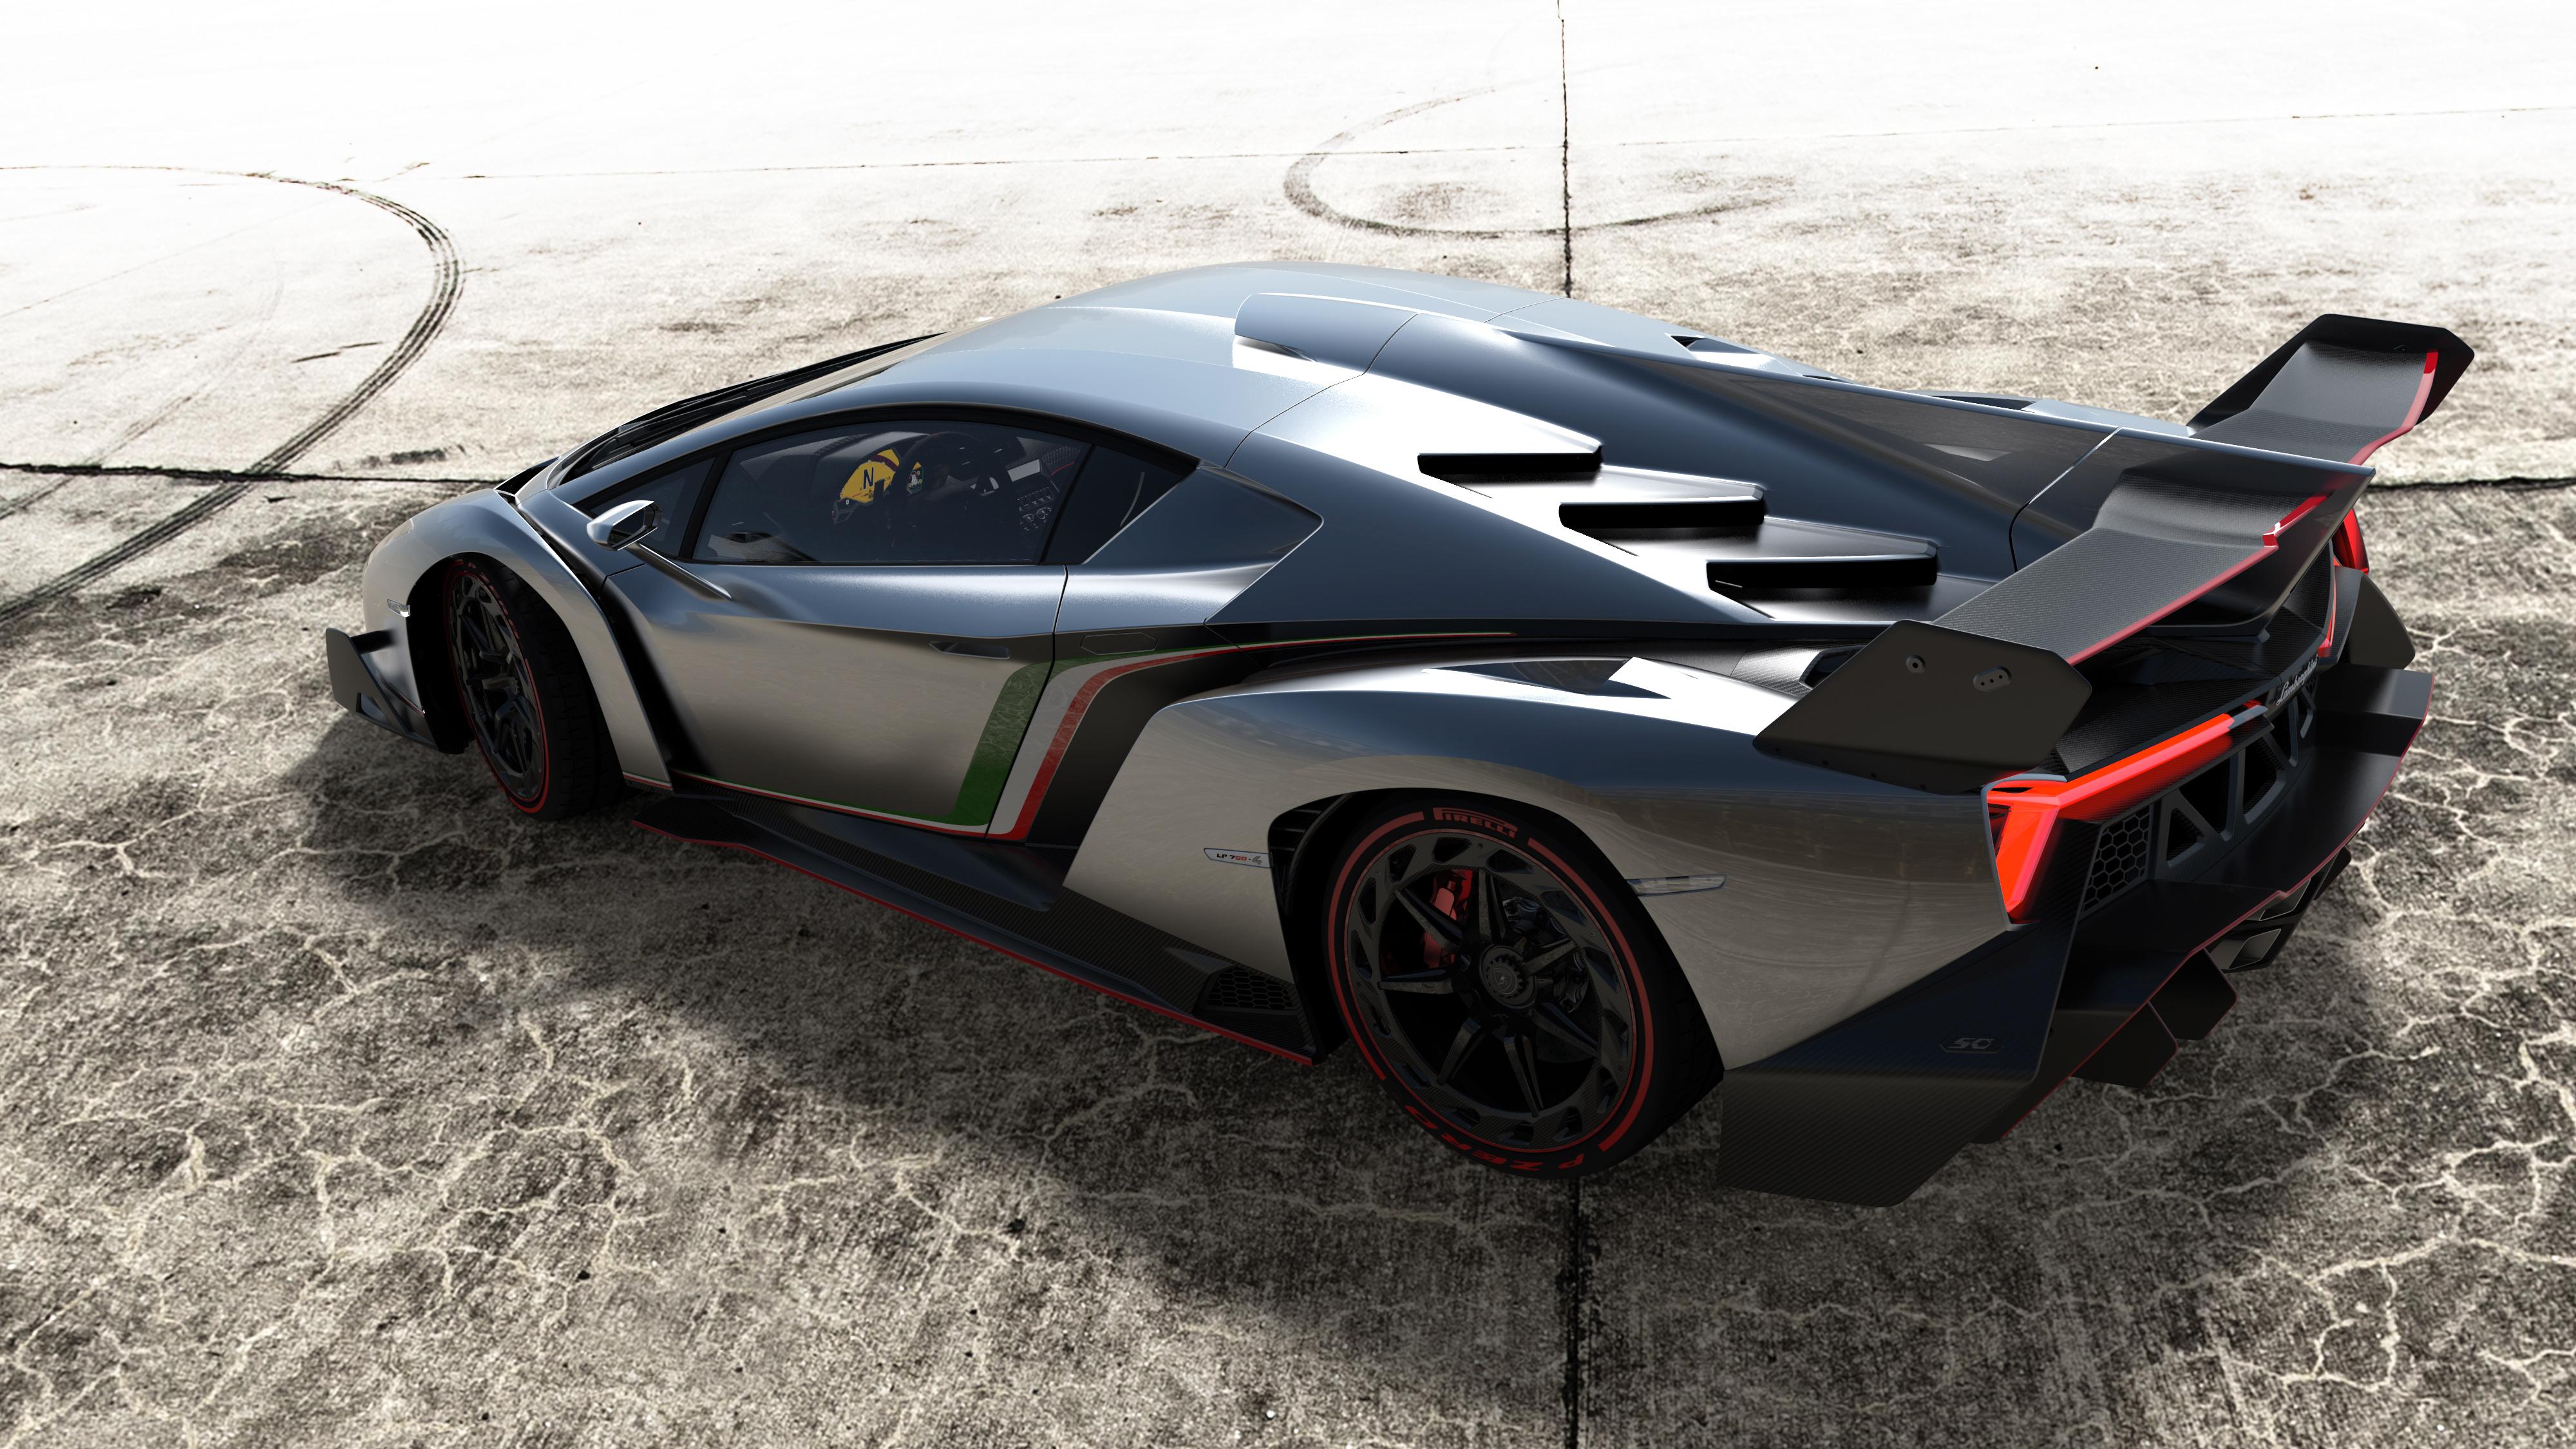 Lamborghini UHD Wallpaper in 4k Desktop Backgrounds 4000x2250